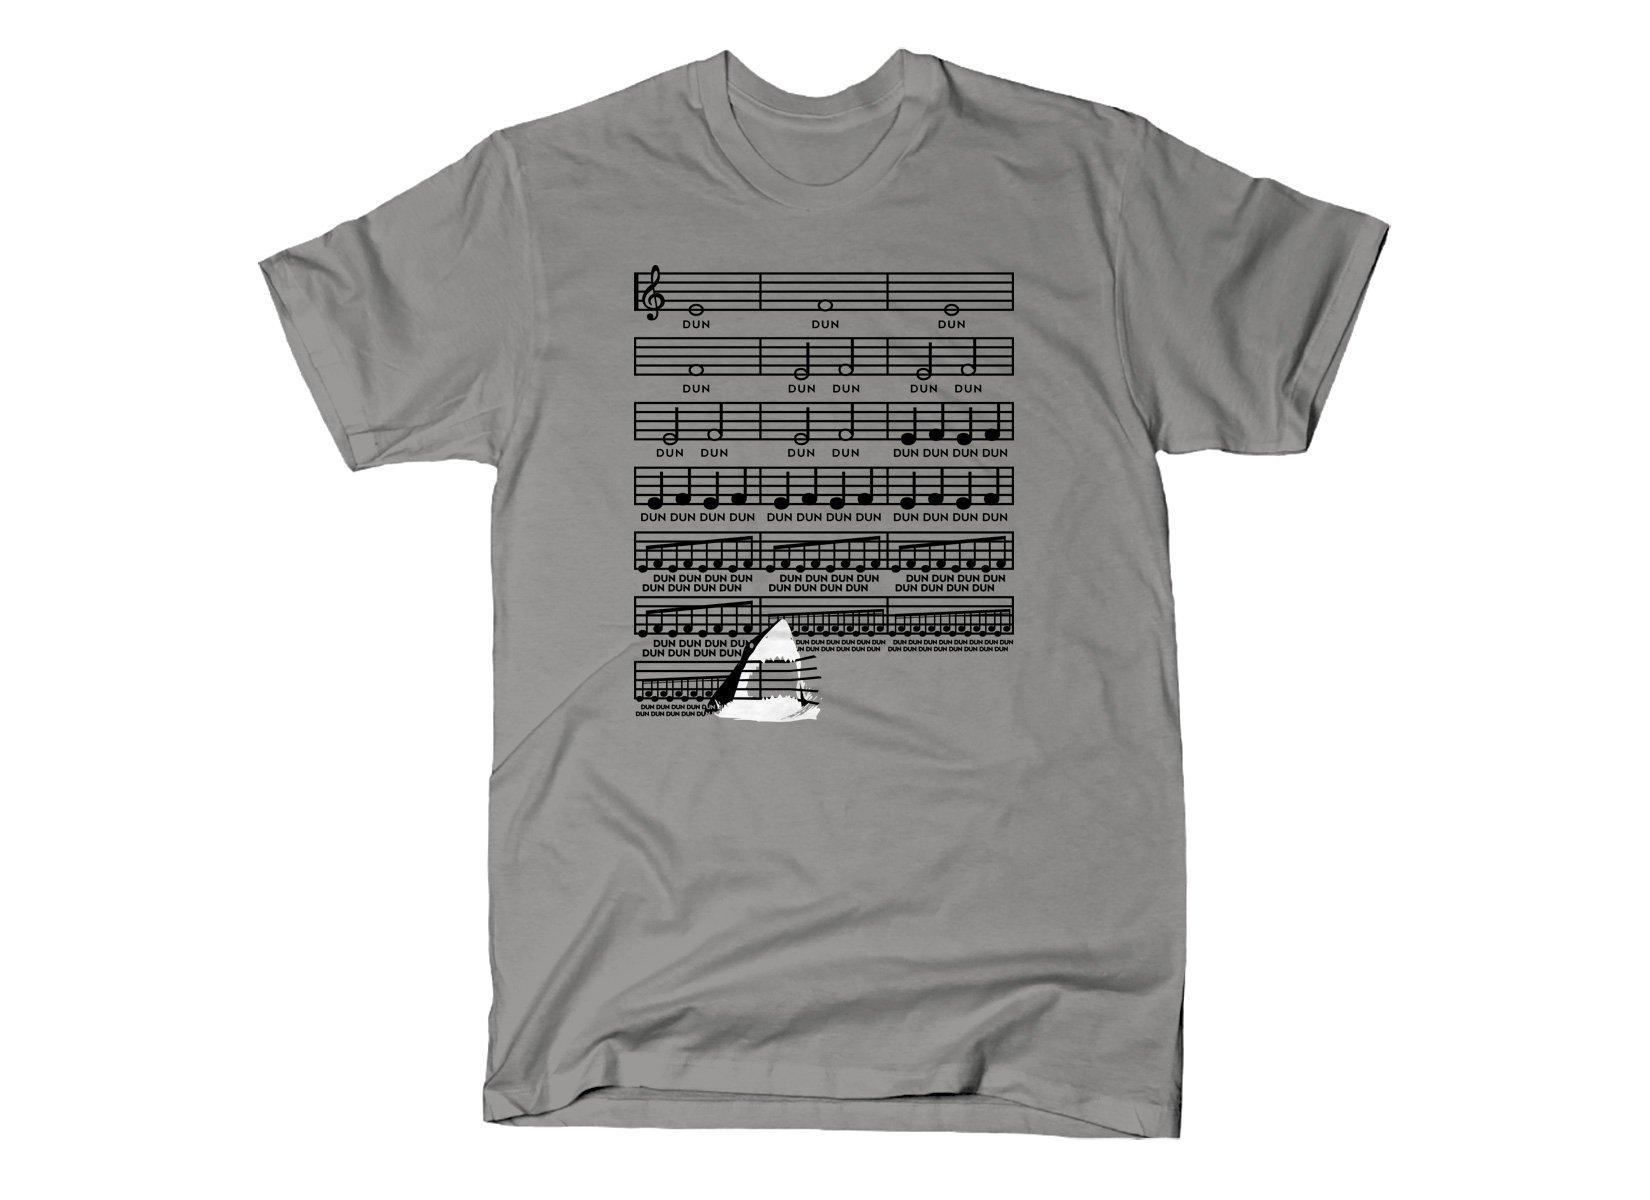 Swimming Theme on Mens T-Shirt